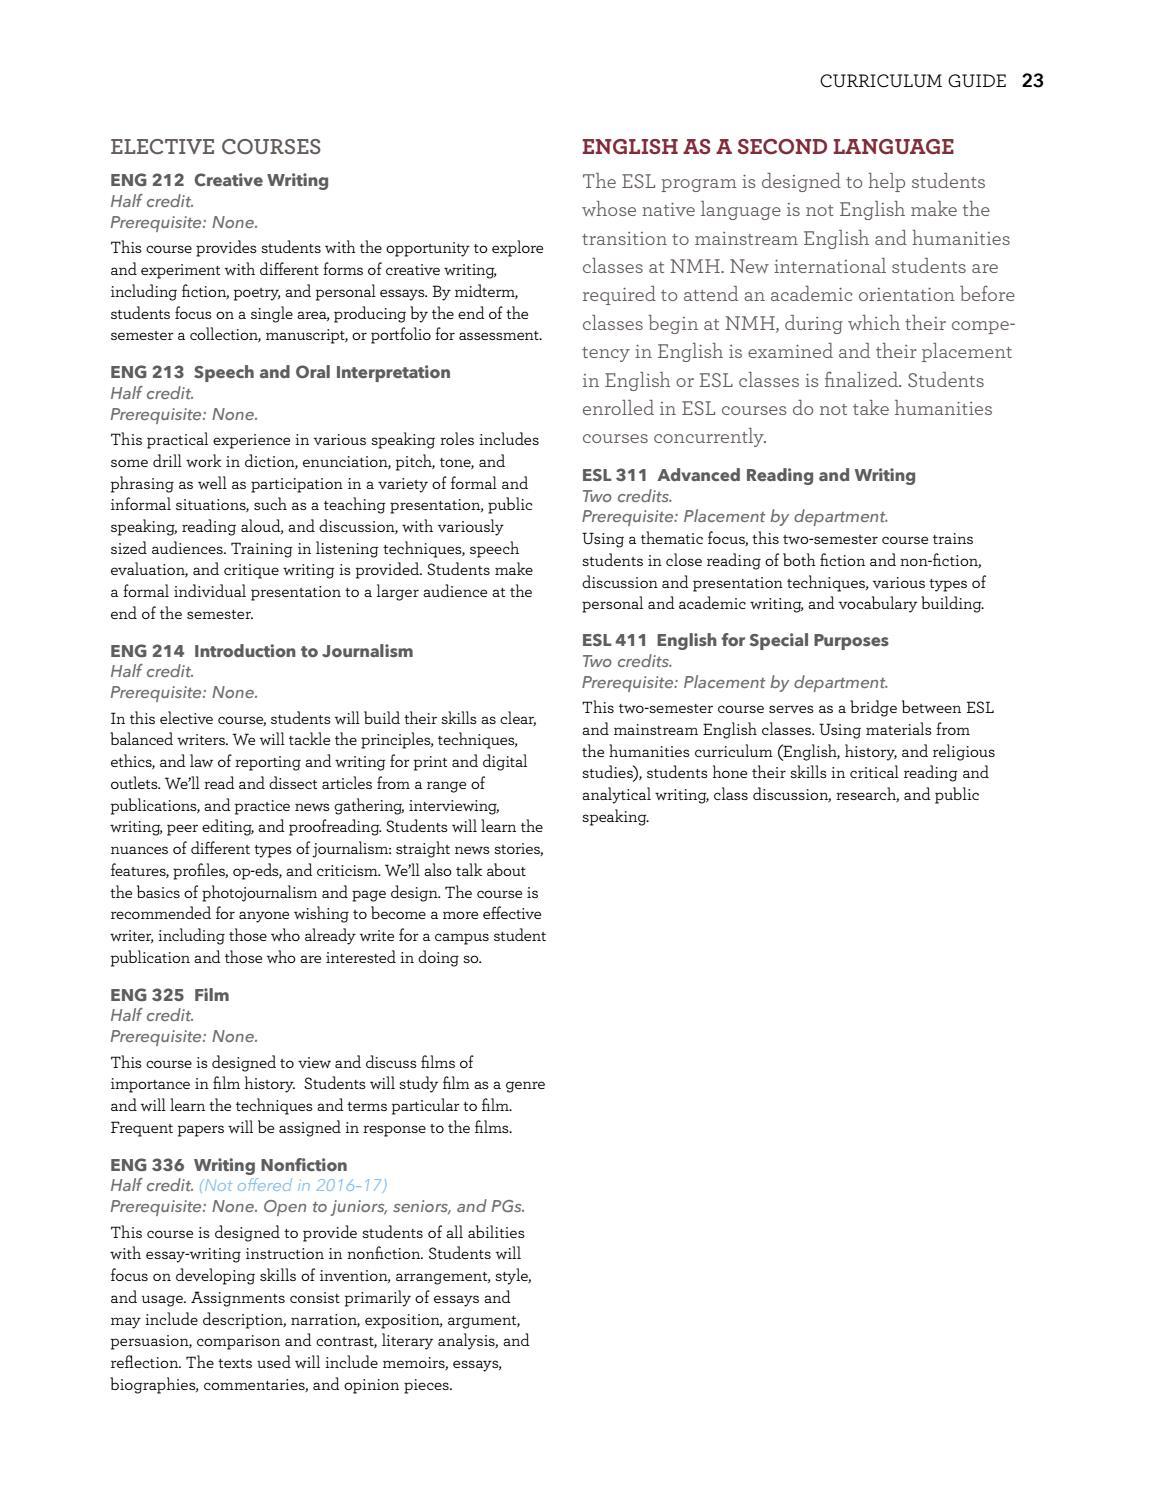 essay about doctors job length